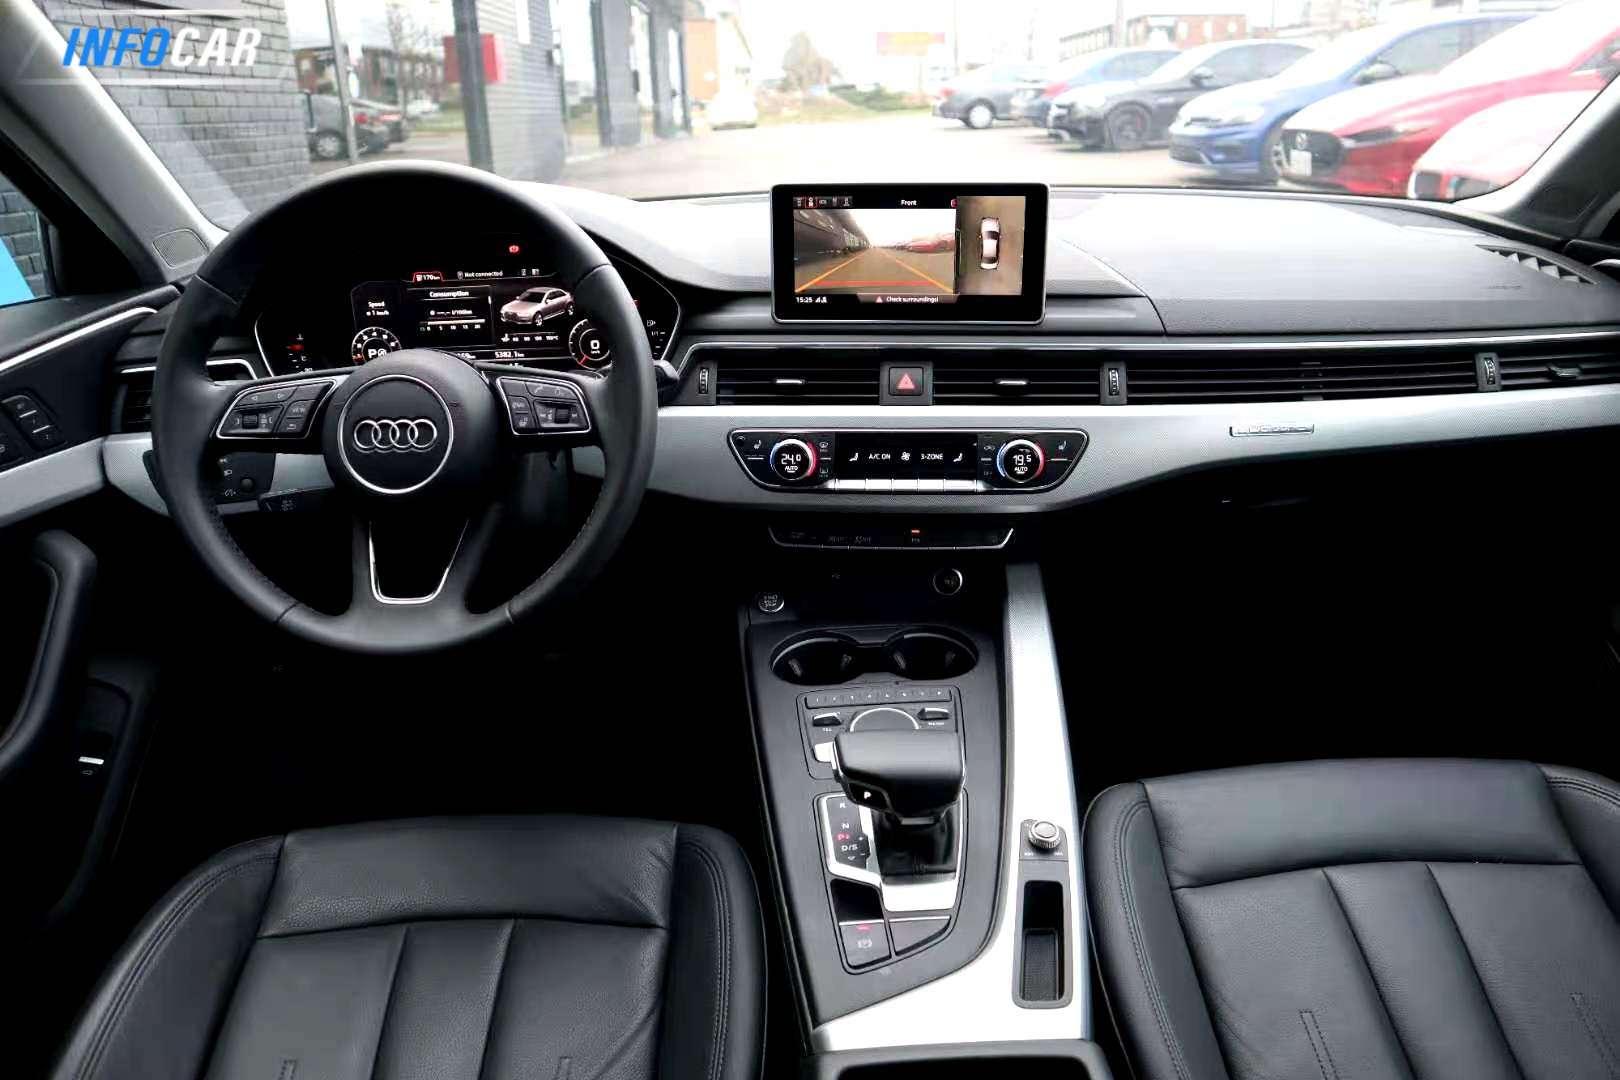 2019 Audi A4 technik - INFOCAR - Toronto's Most Comprehensive New and Used Auto Trading Platform